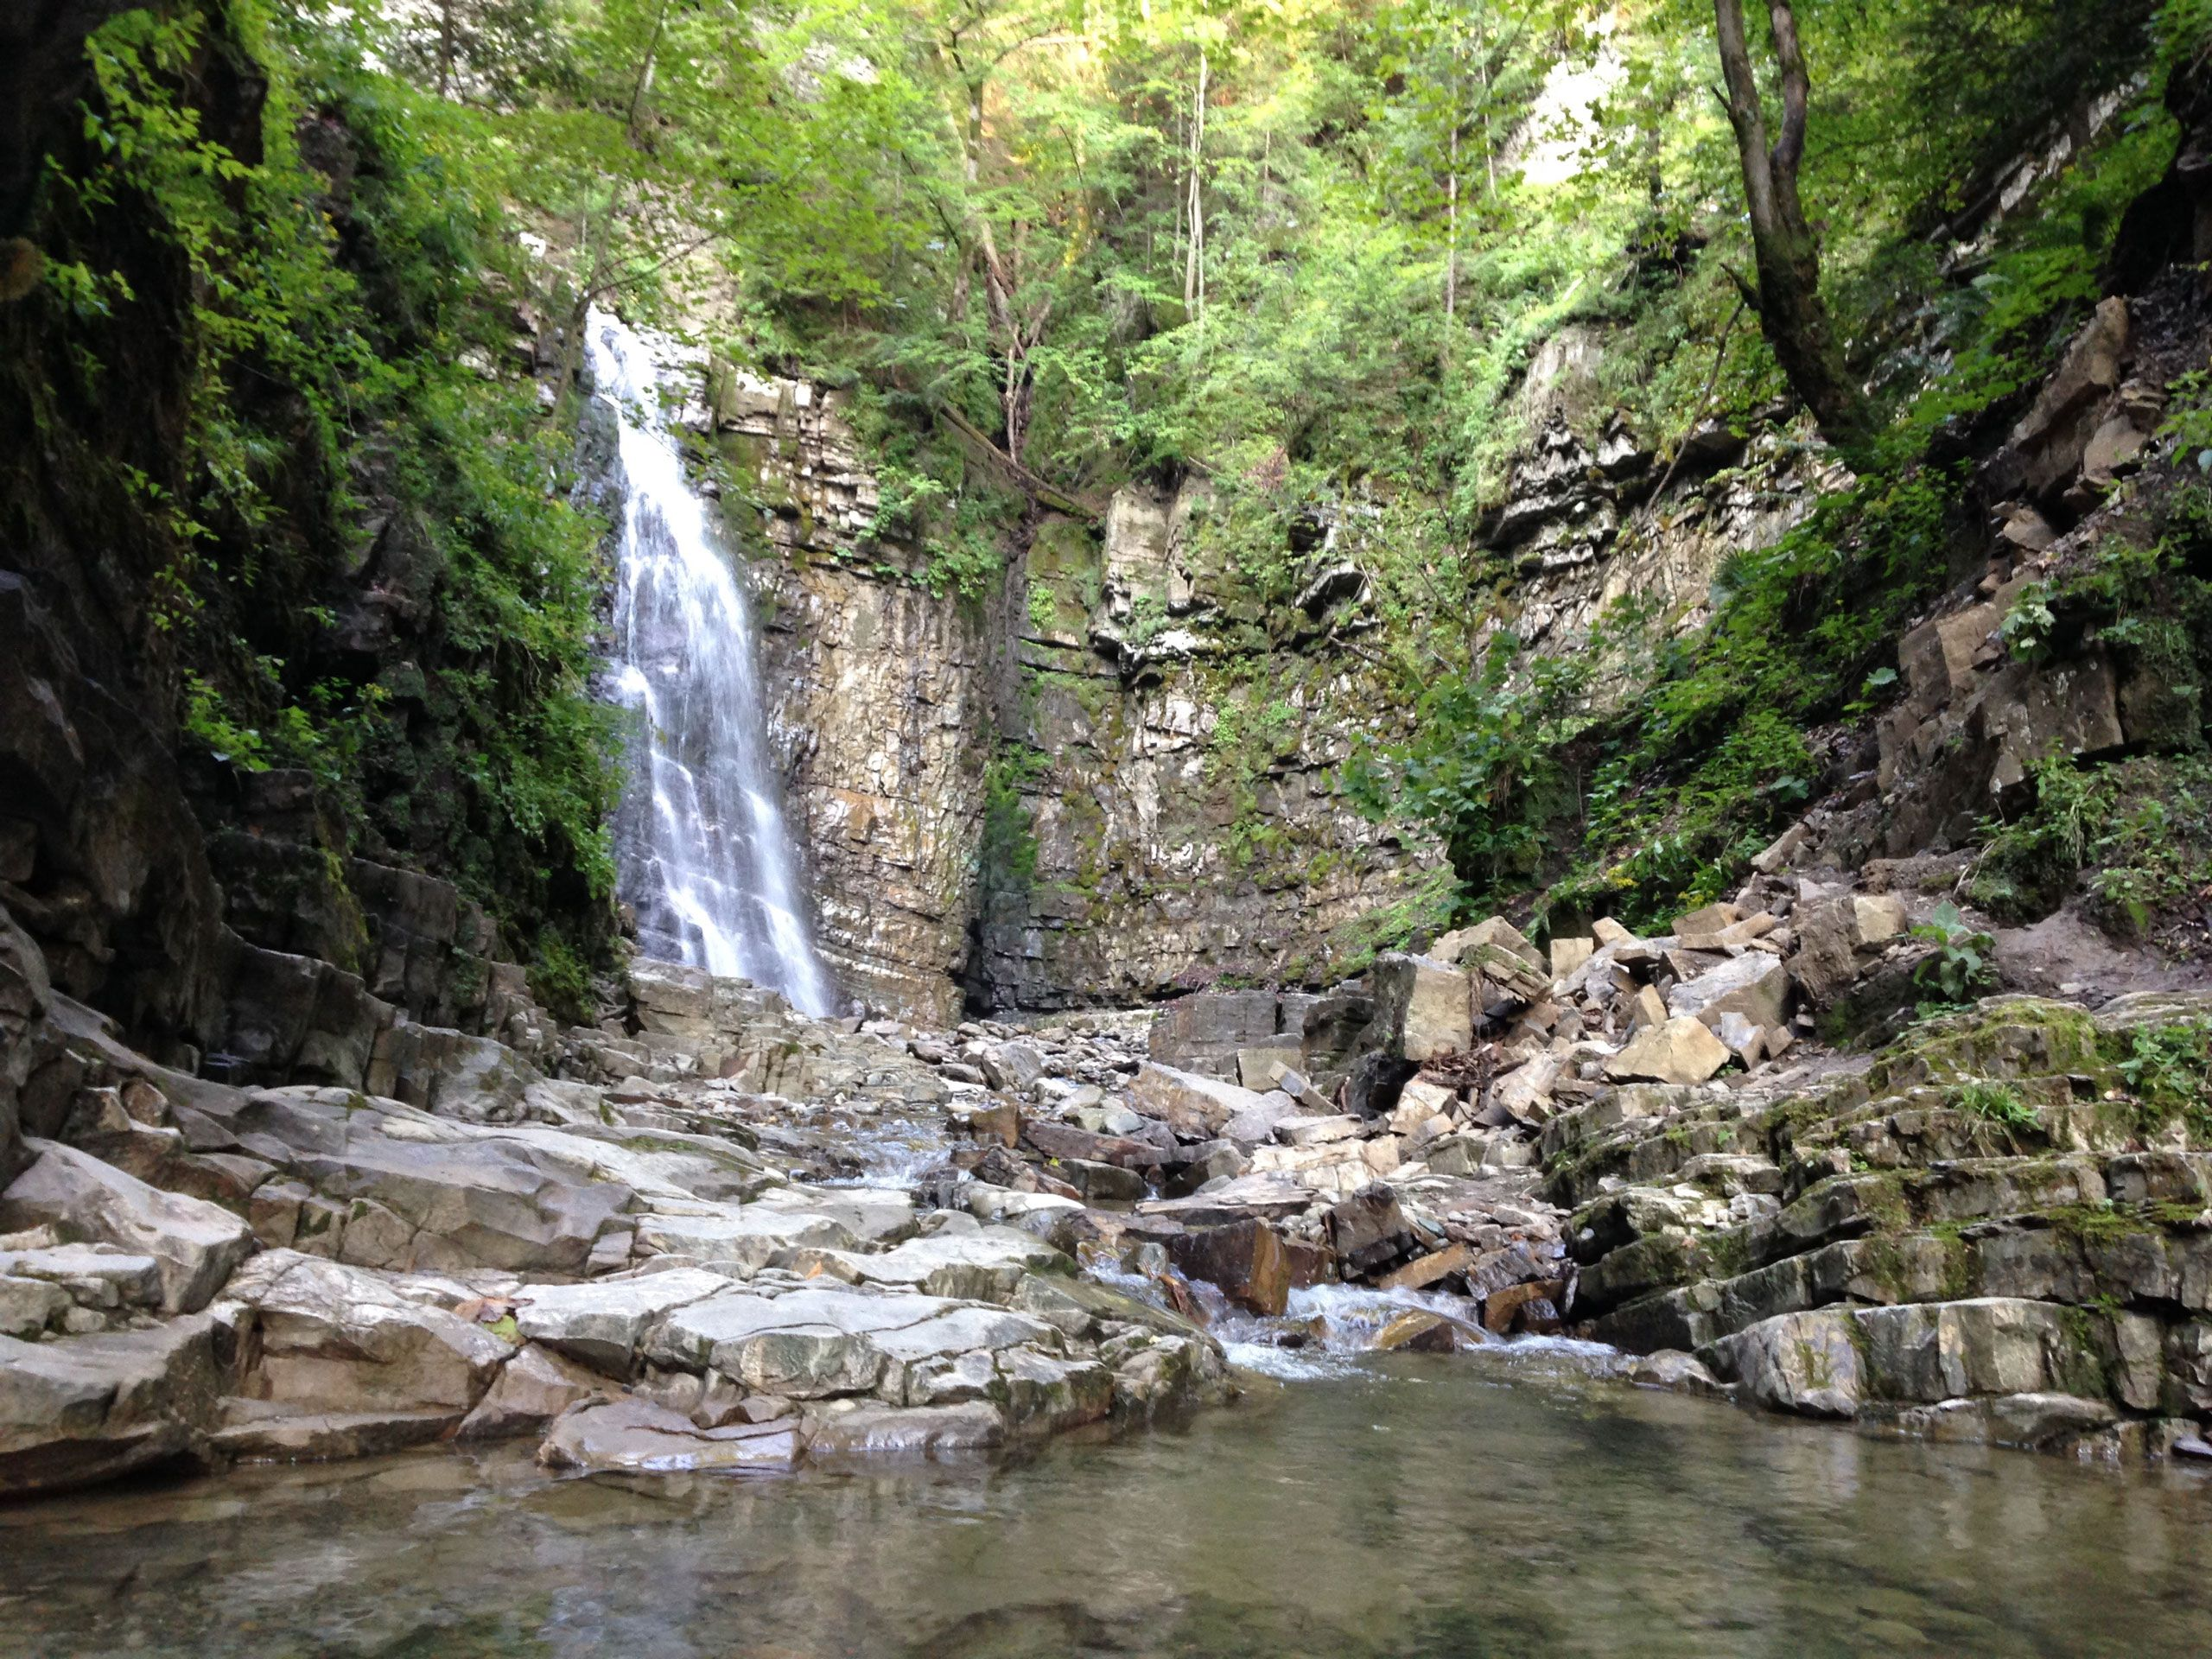 The highest waterfall in the Carpathian region and one of the highest in Ukraine. Maniava waterfall, Karpaty, Ukraine